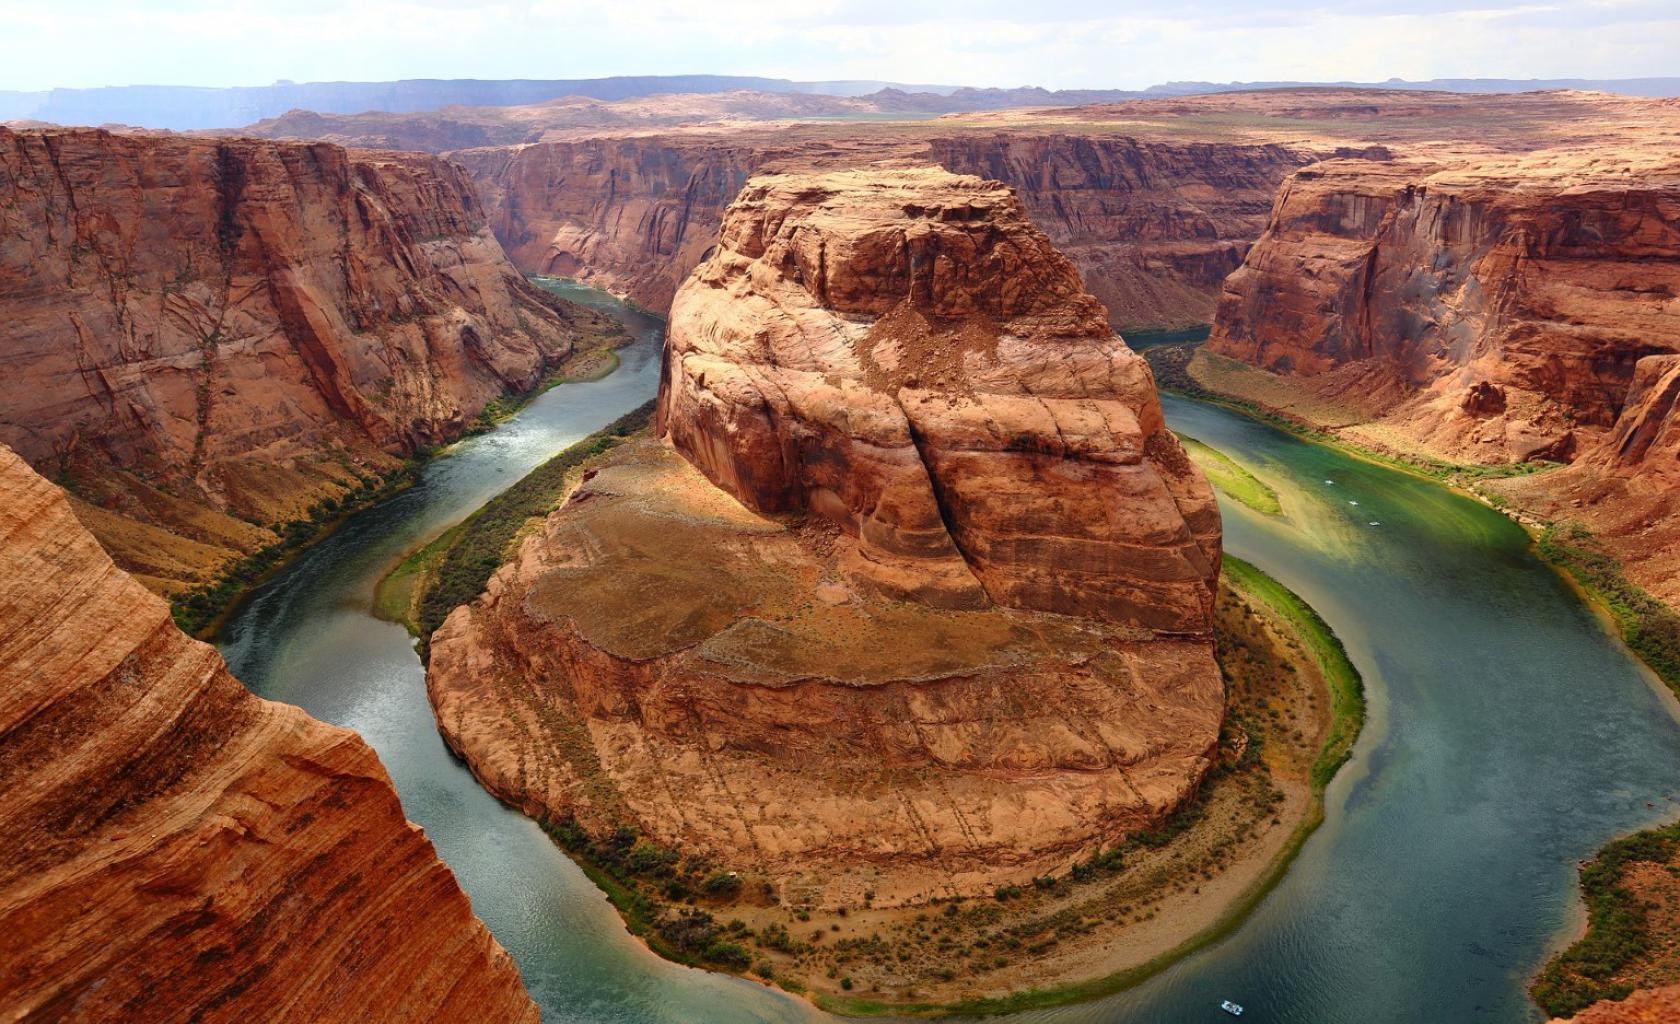 Arizona - Horseshoe Bend